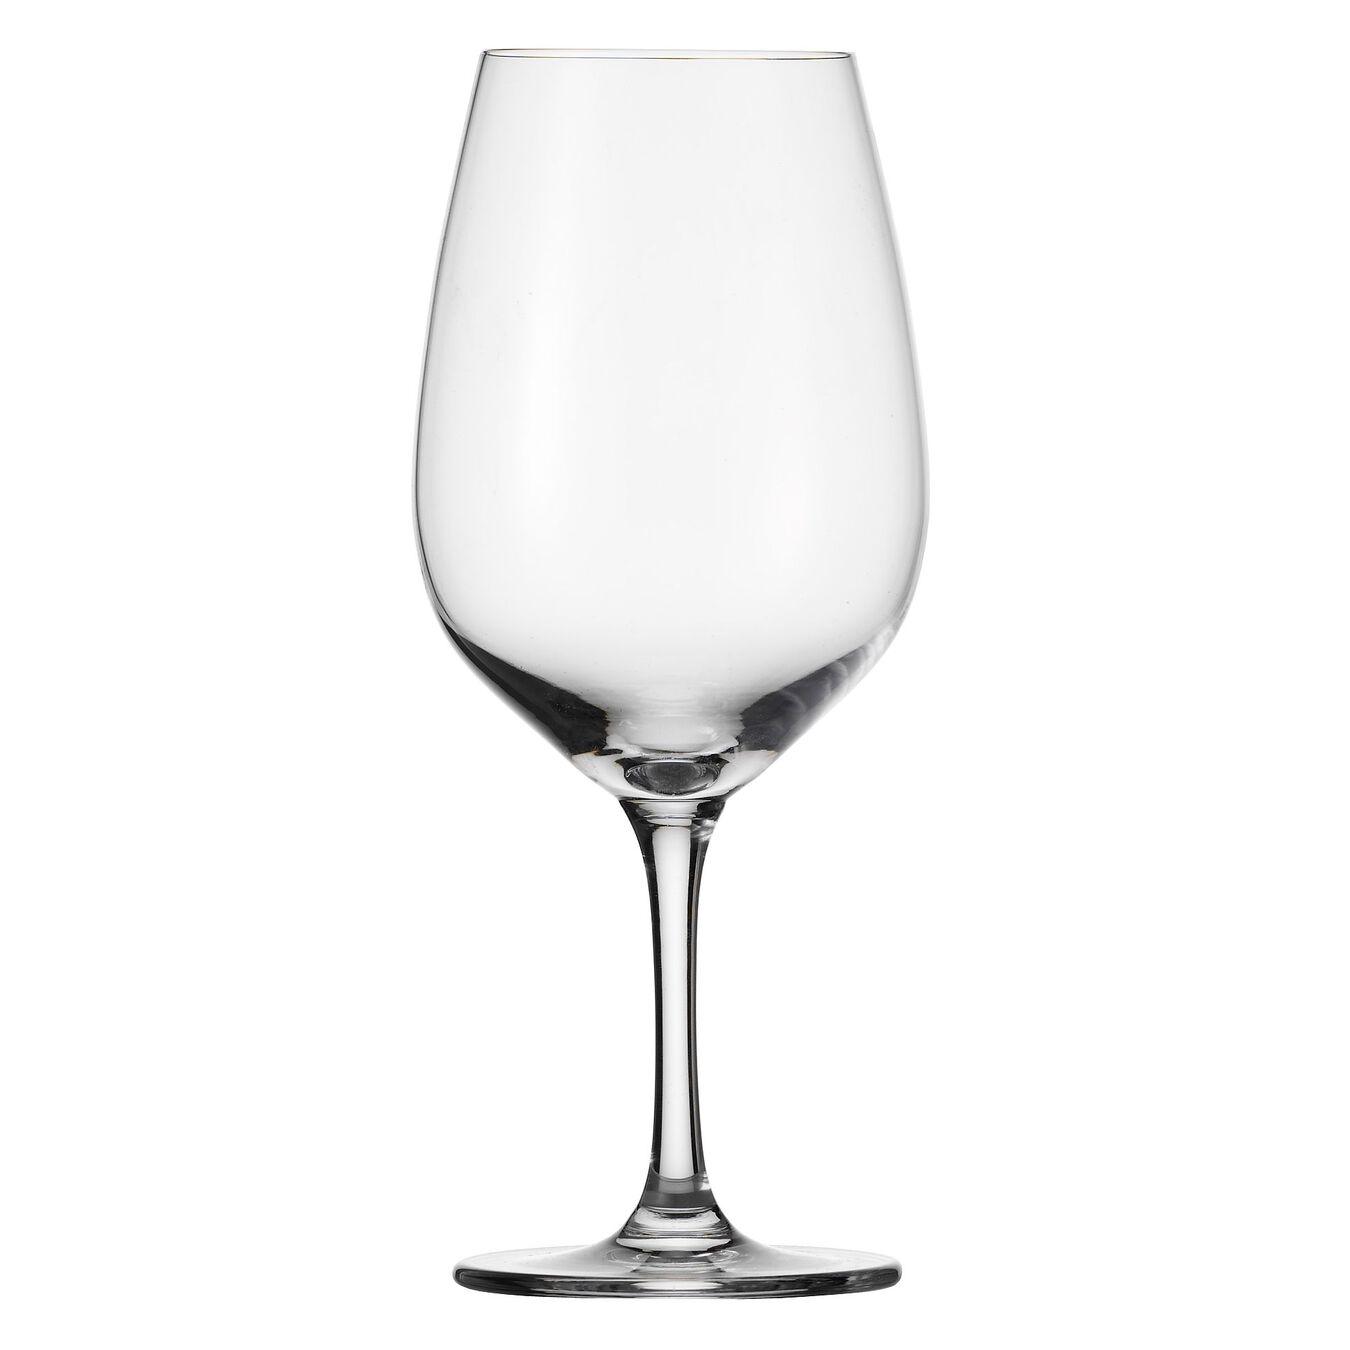 Taça para vinho tinto 620 ml,,large 1